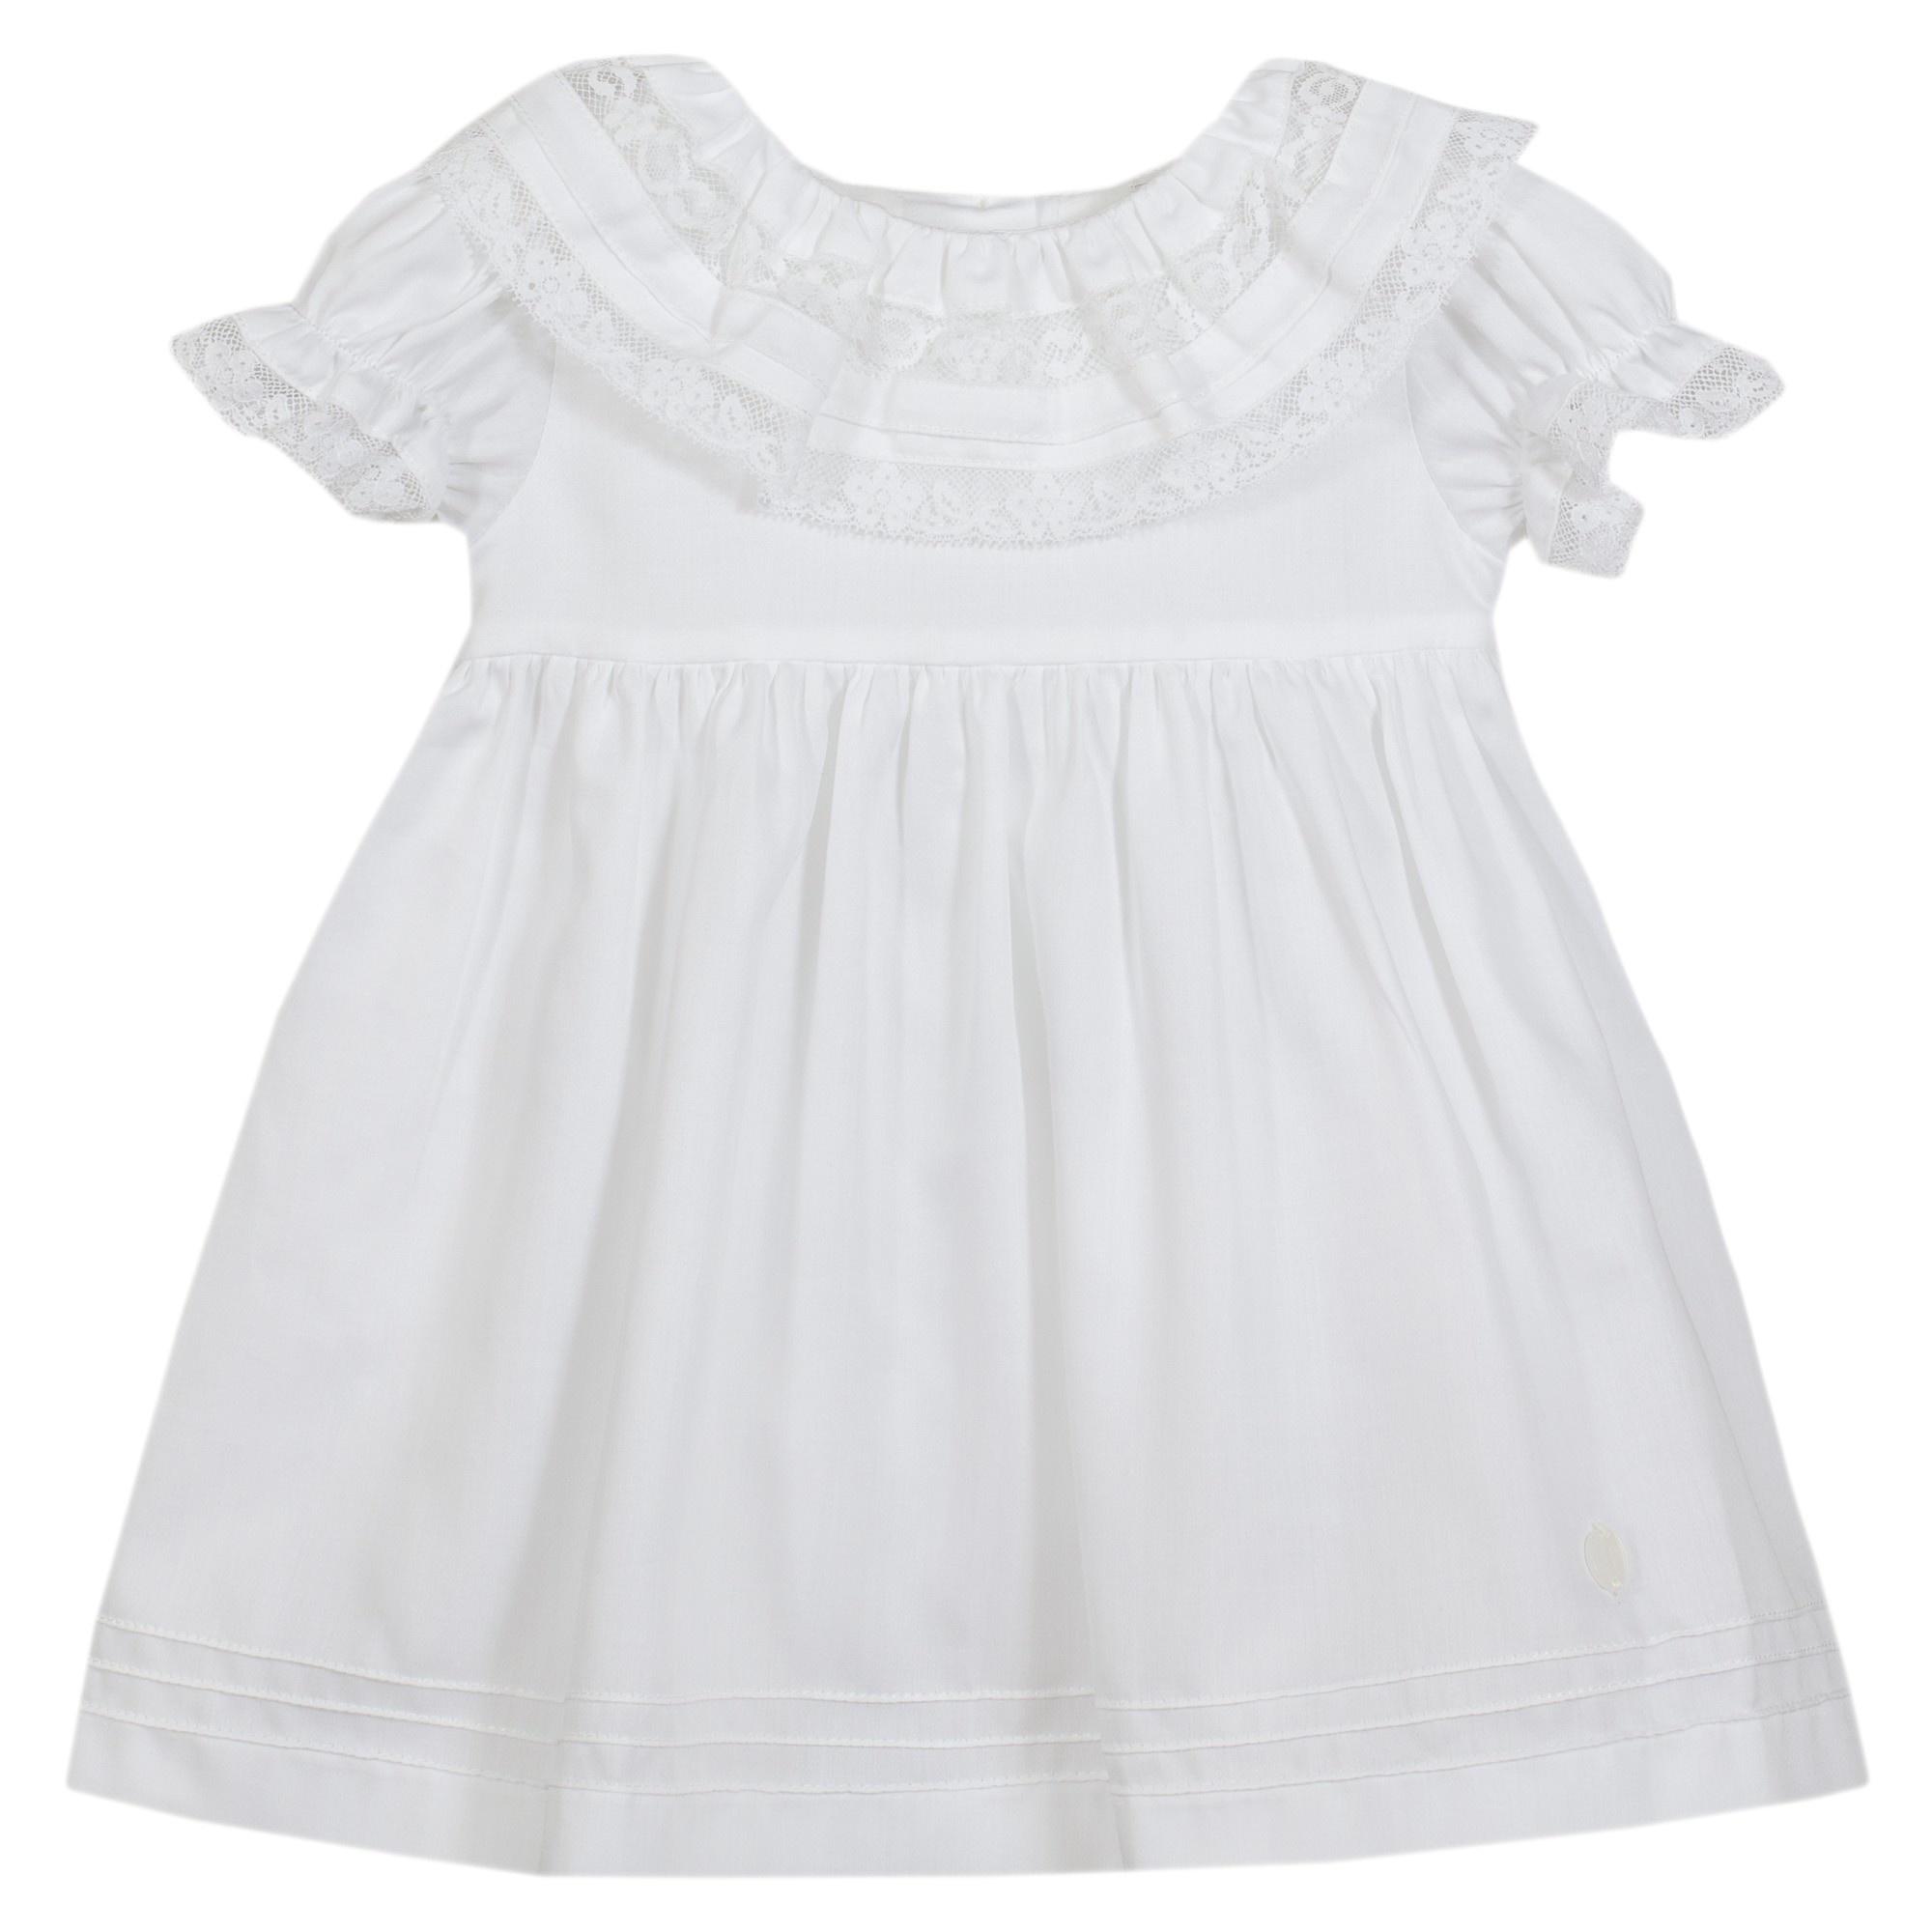 PATACHOU | Wit jurkje met prachtige kanten kraag-1